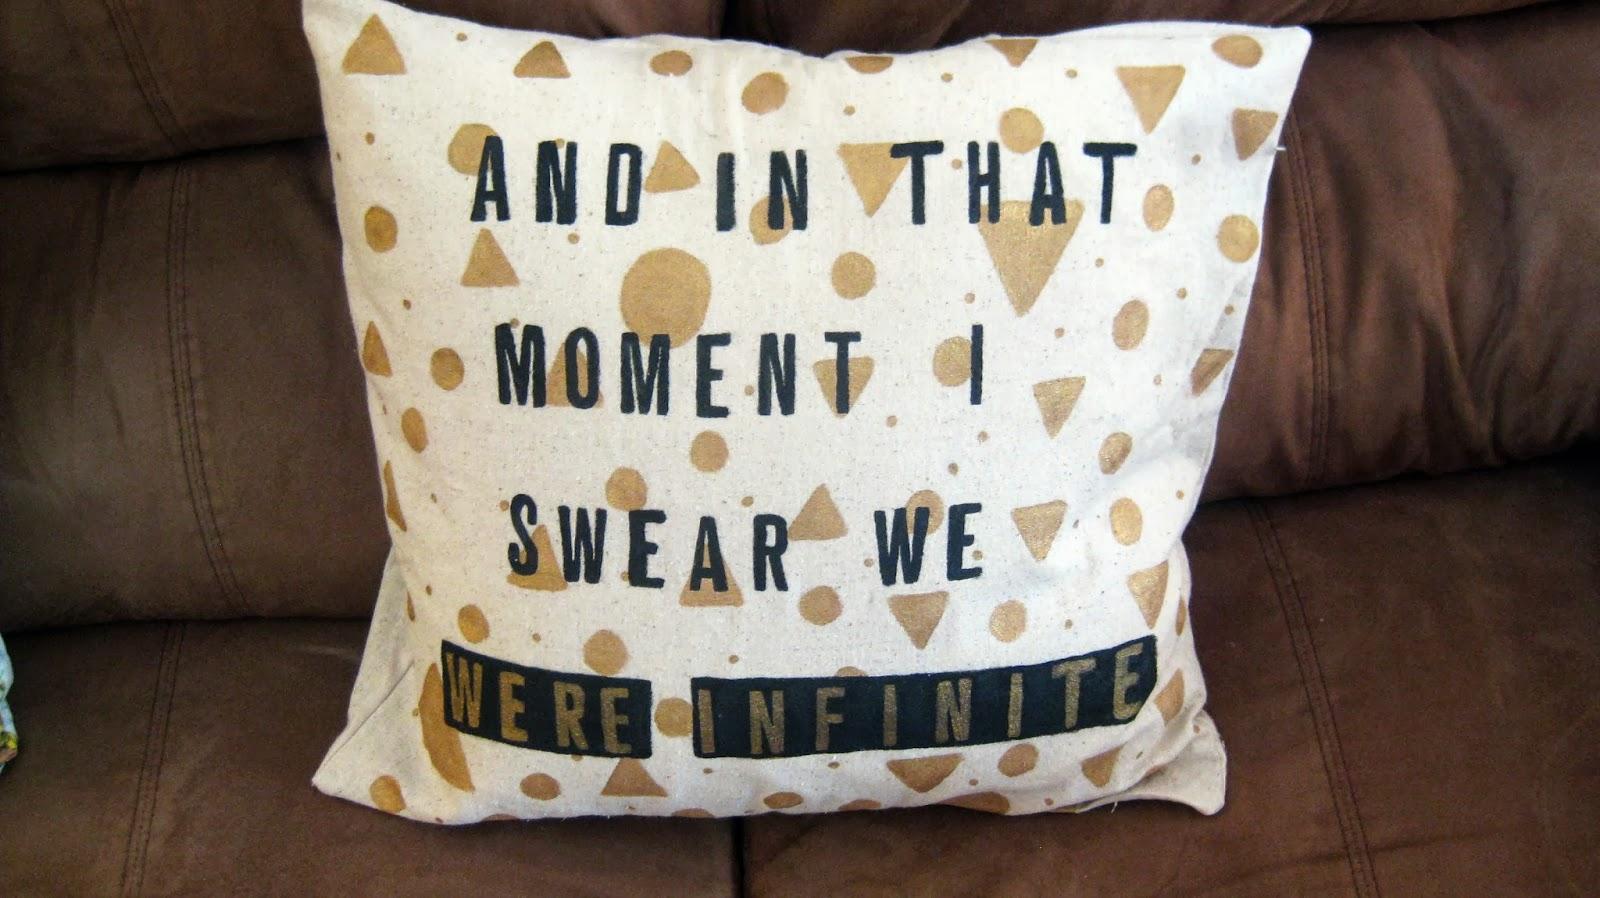 Diy Painted Throw Pillows : kaleidoscopekanvas-KK: Painted Envelope Throw Pillow Cover DIY